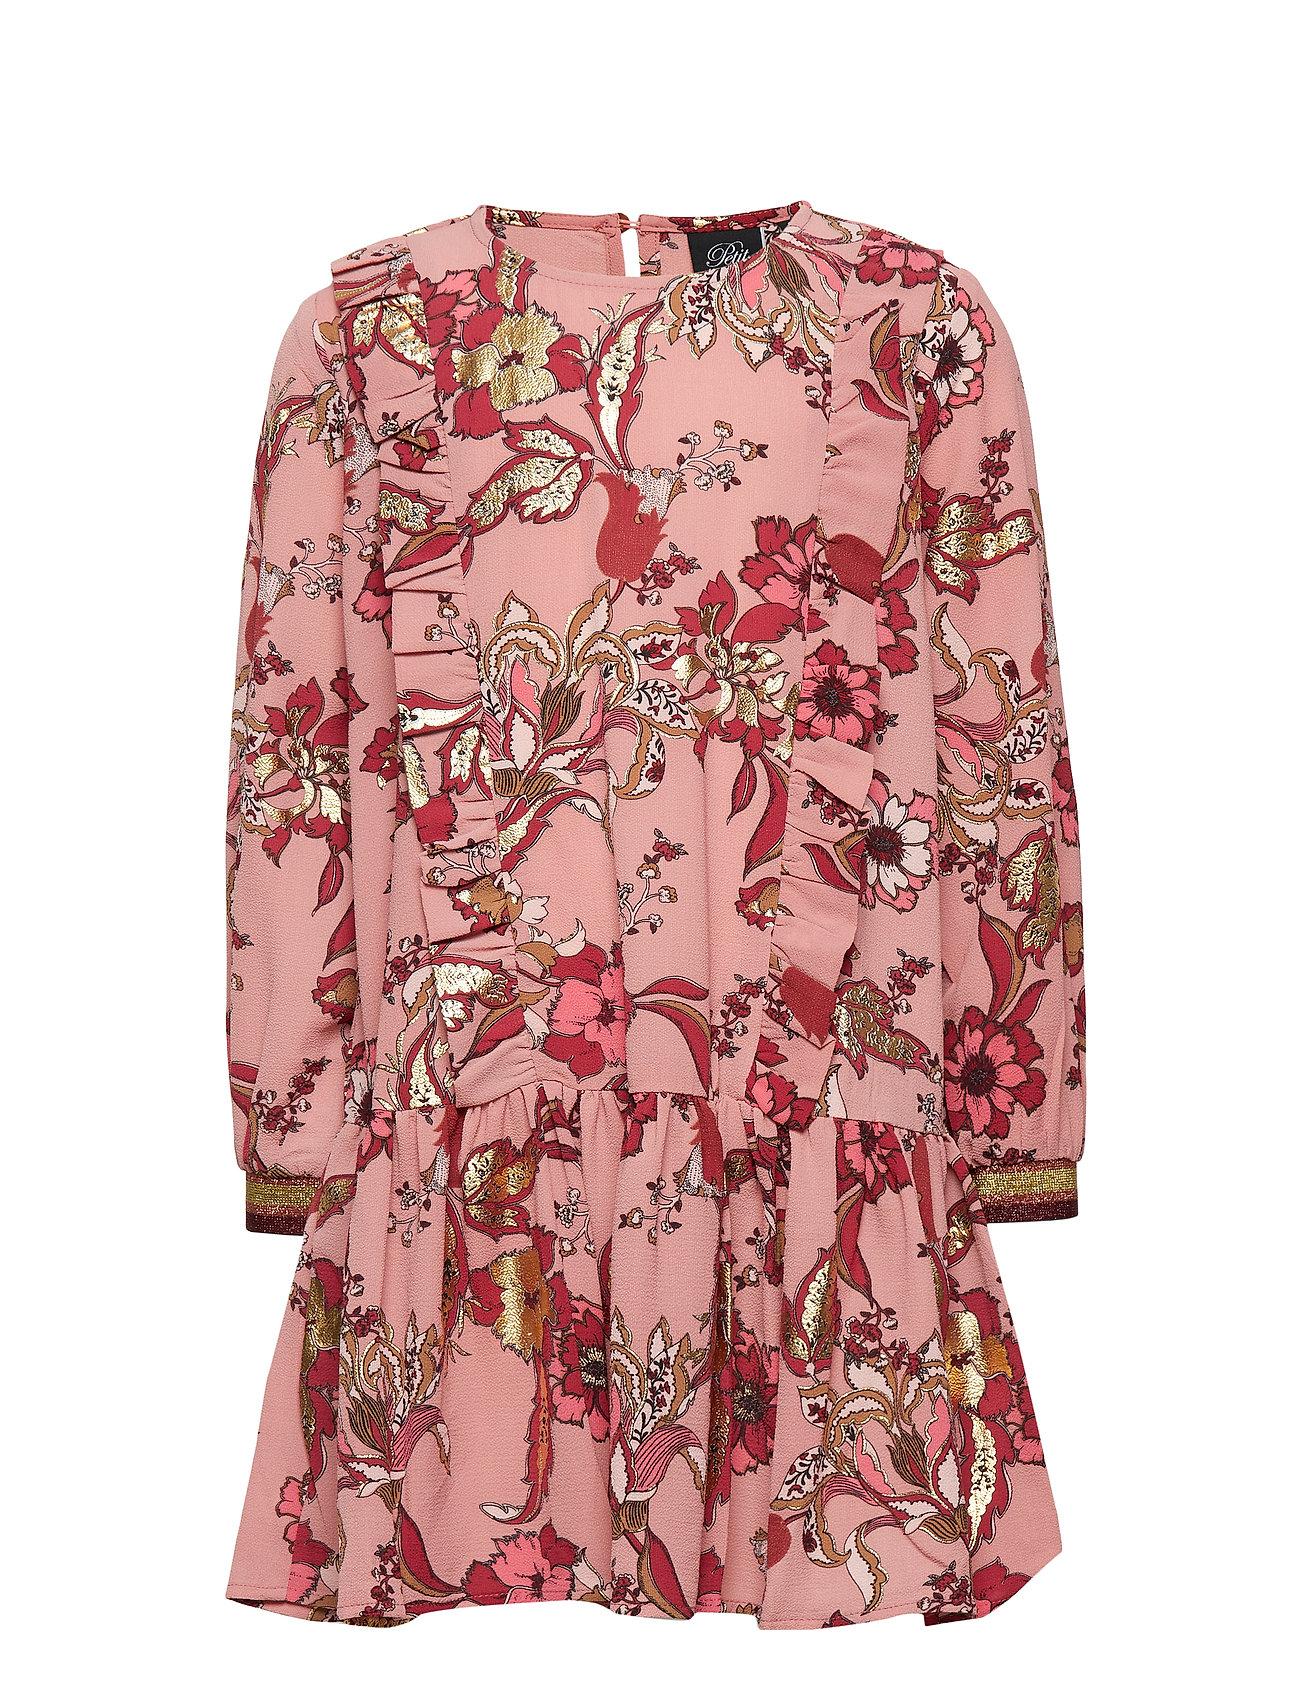 Petit by Sofie Schnoor Dress - ROSE